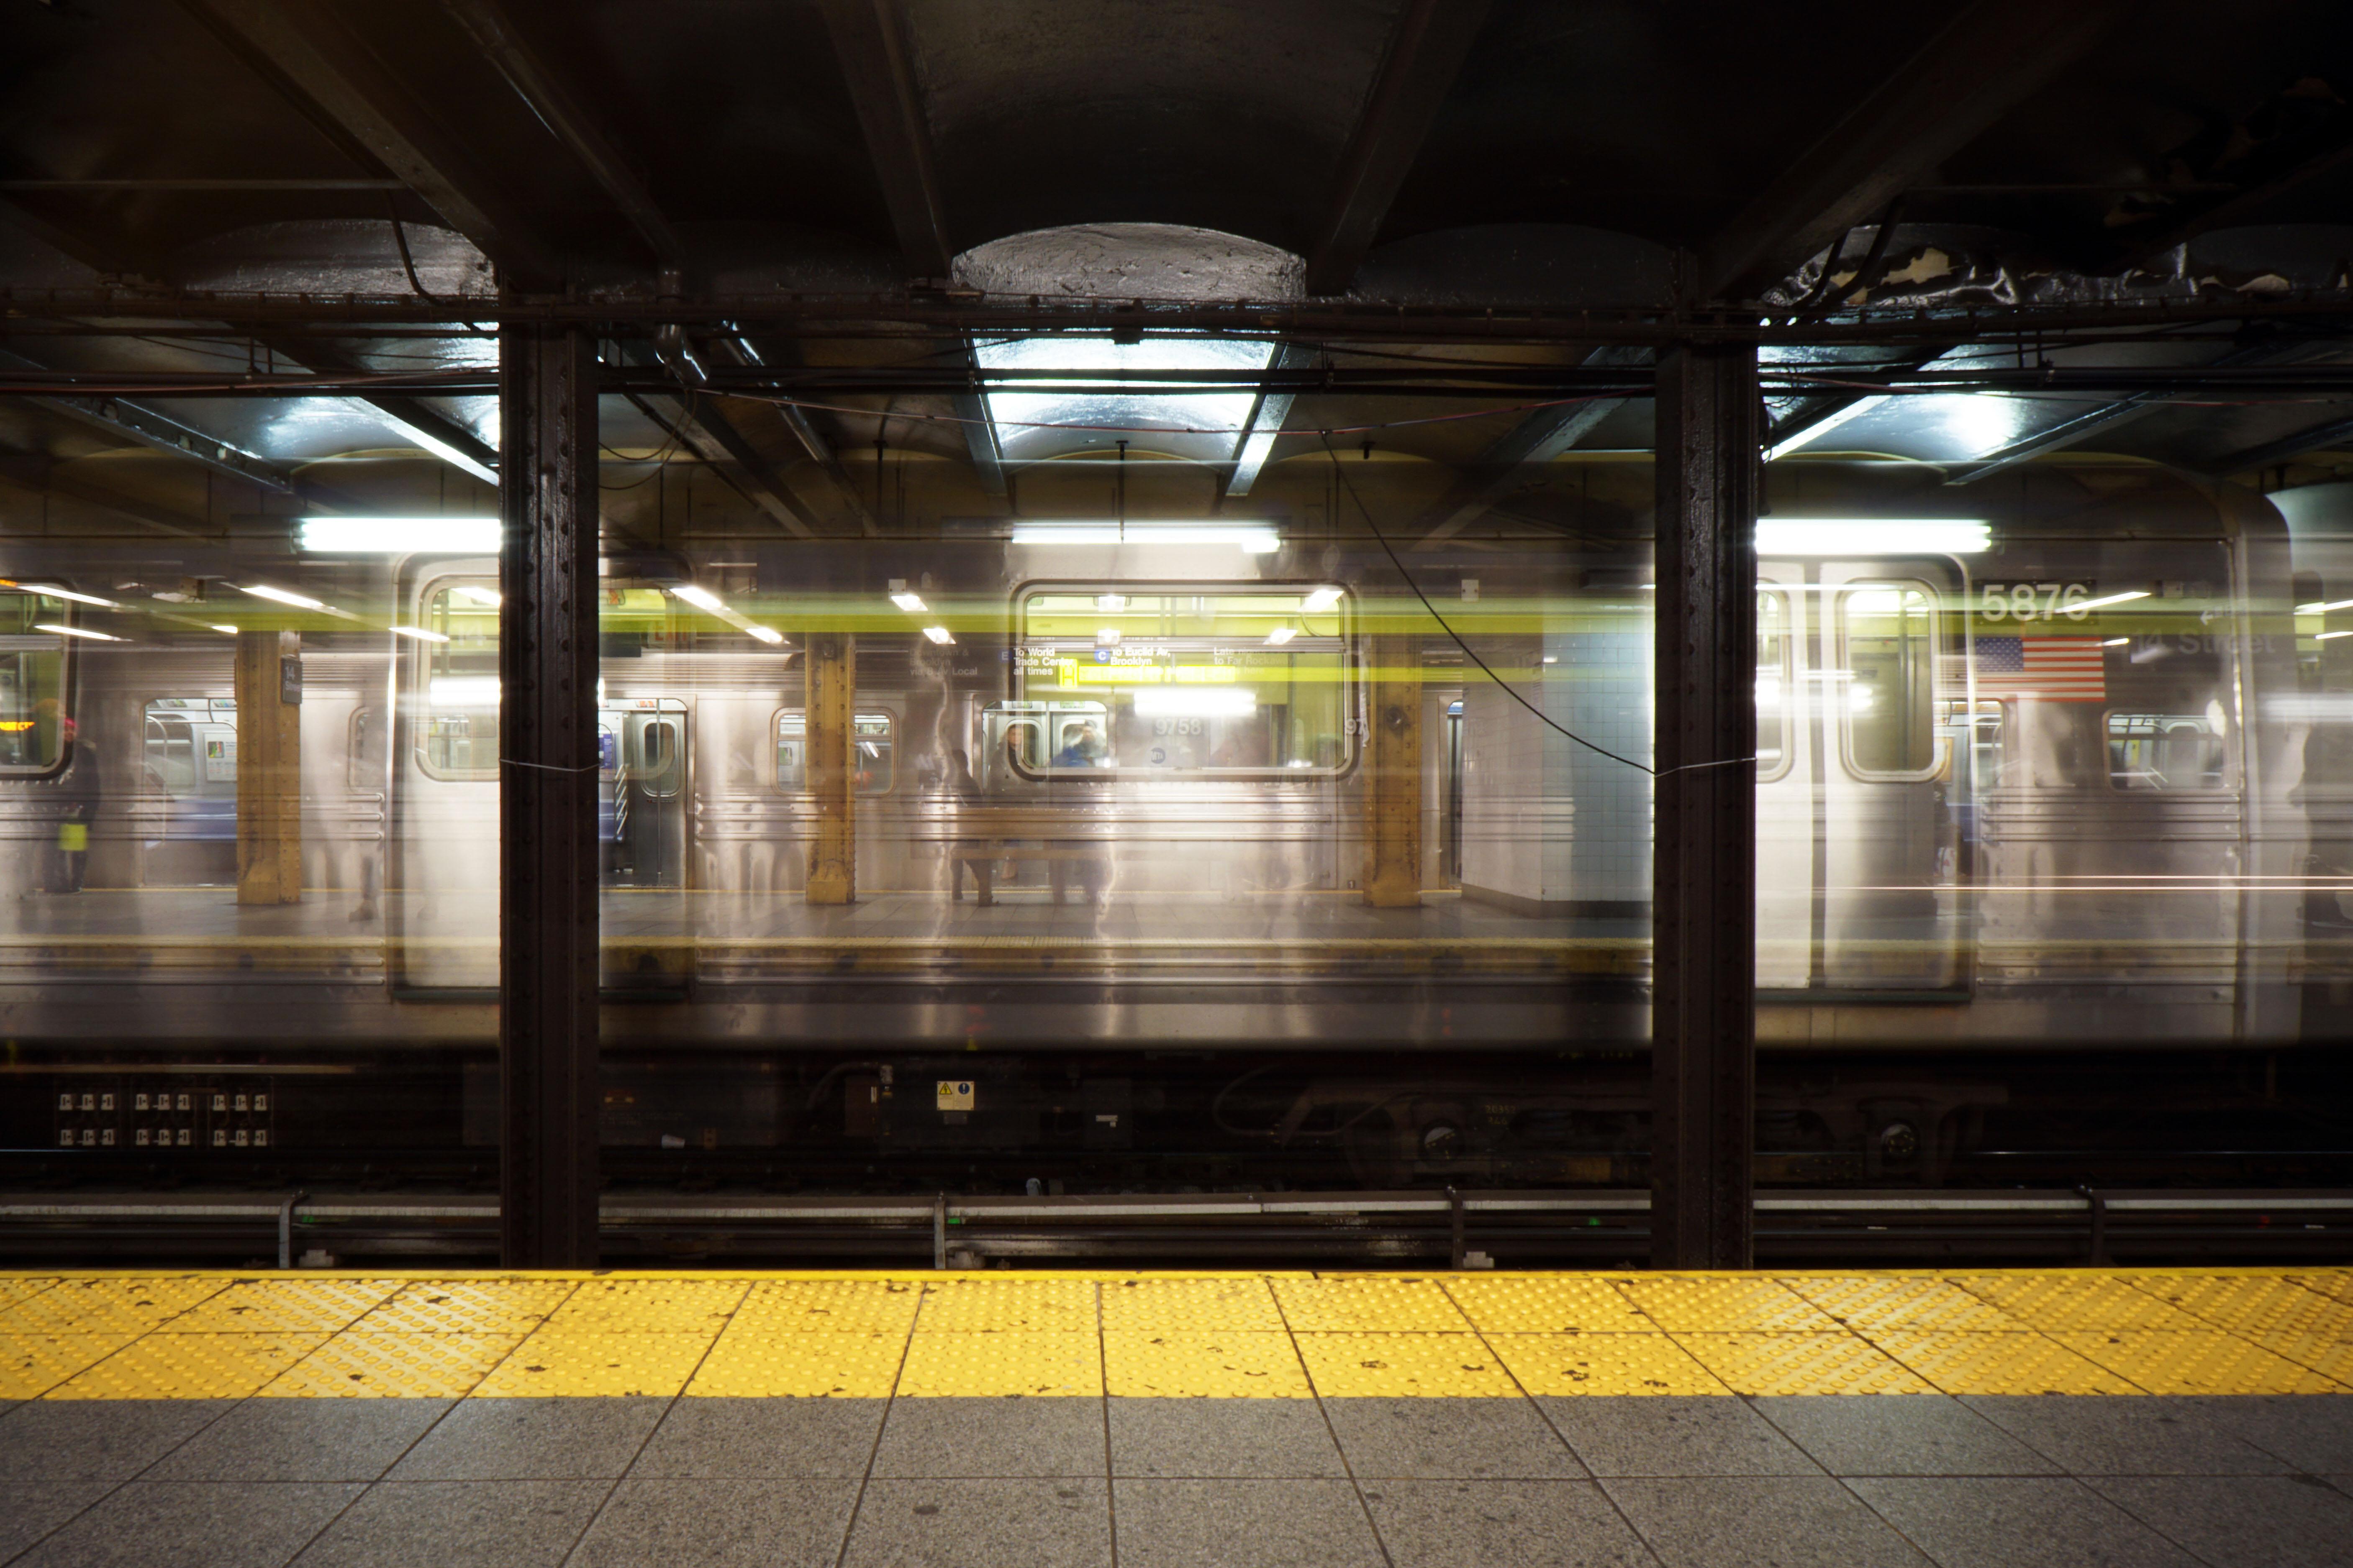 Free Images light blur night subway motion vehicle train